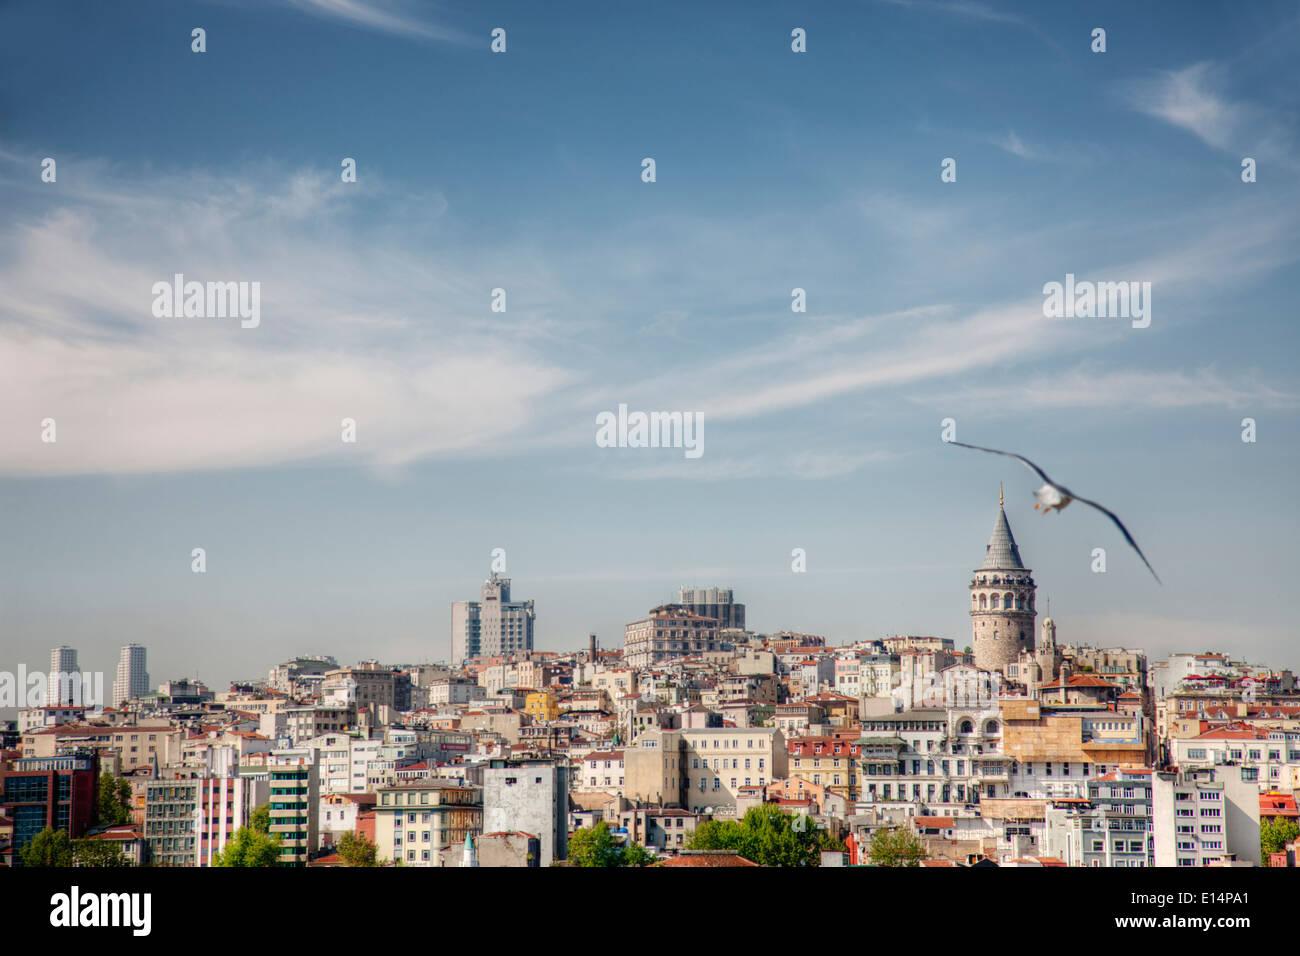 Istanbul city skyline sous ciel bleu, Turquie Photo Stock